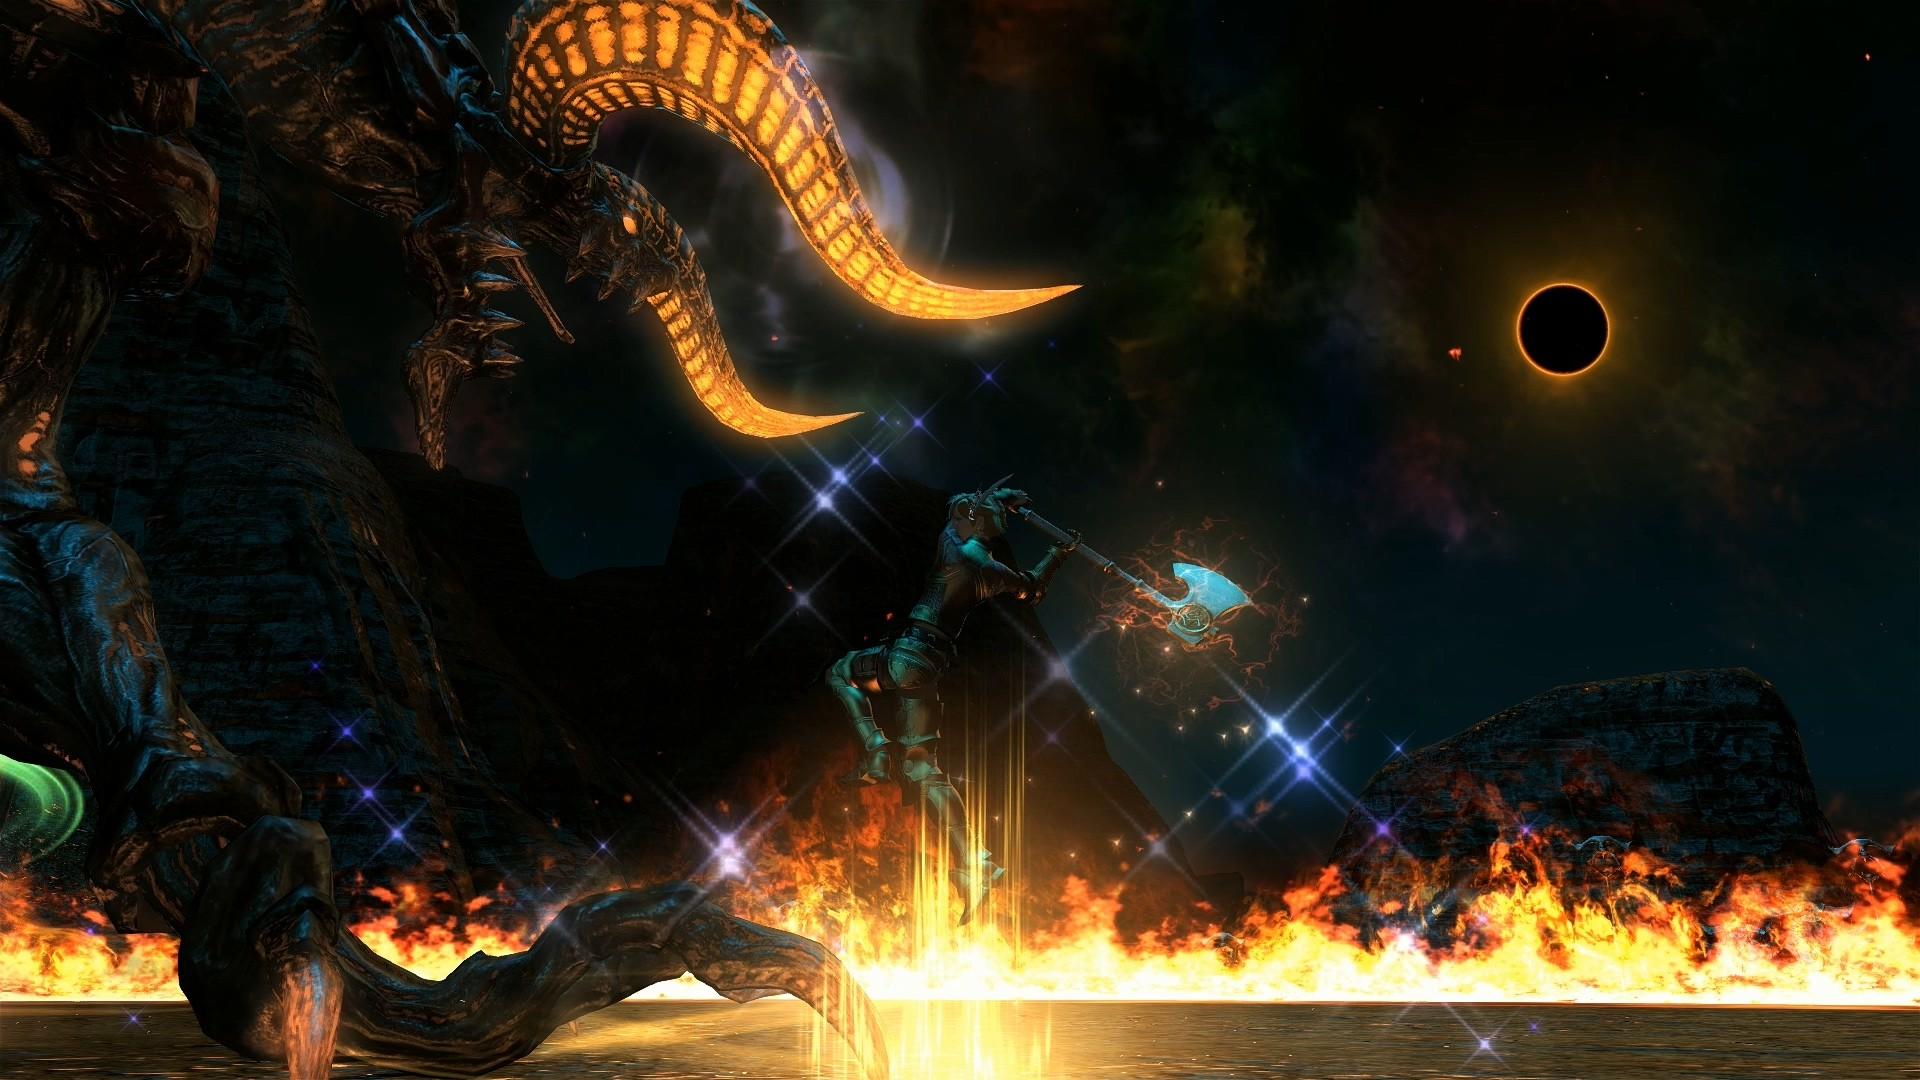 Beautiful Wallpaper Night Dragon - video-games-night-dragon-Final-Fantasy-XIV-A-Realm-Reborn-flame-darkness-screenshot-computer-wallpaper-special-effects-159174  Gallery.jpg